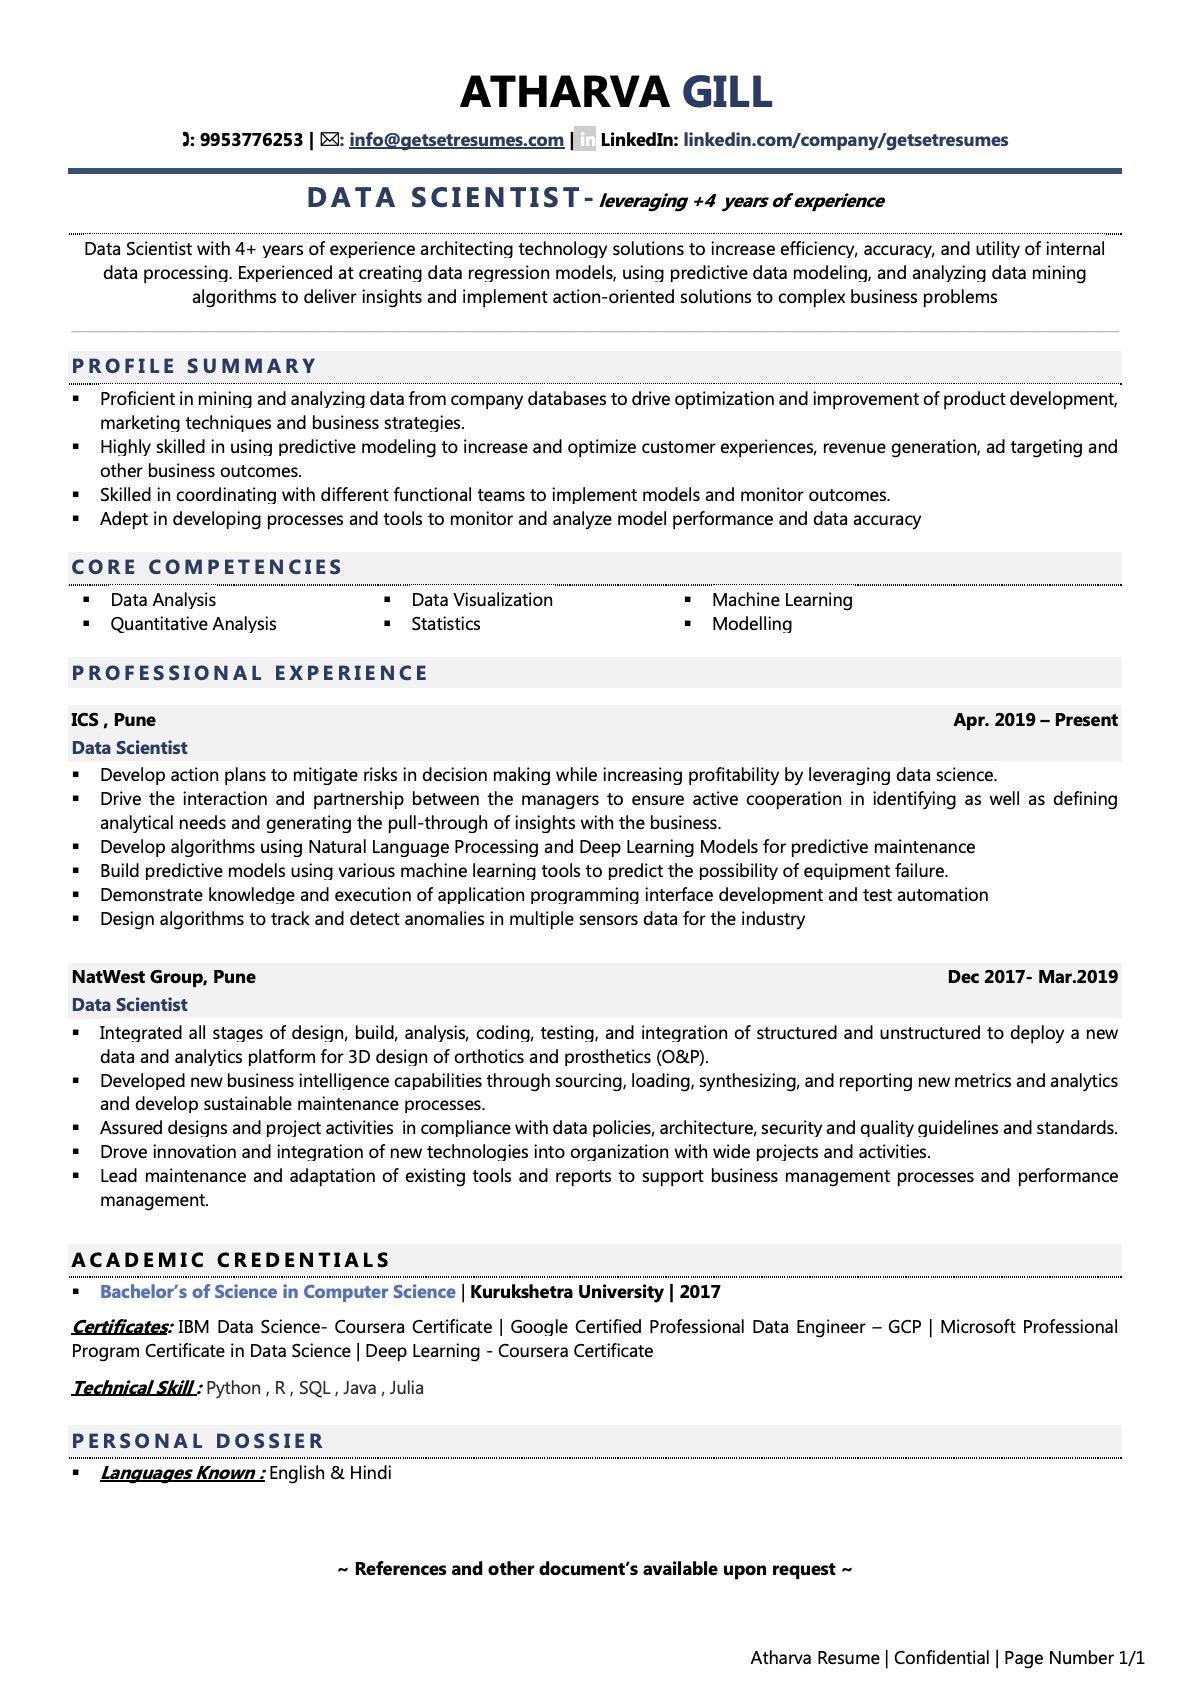 Data Scientist - Resume Example & Template